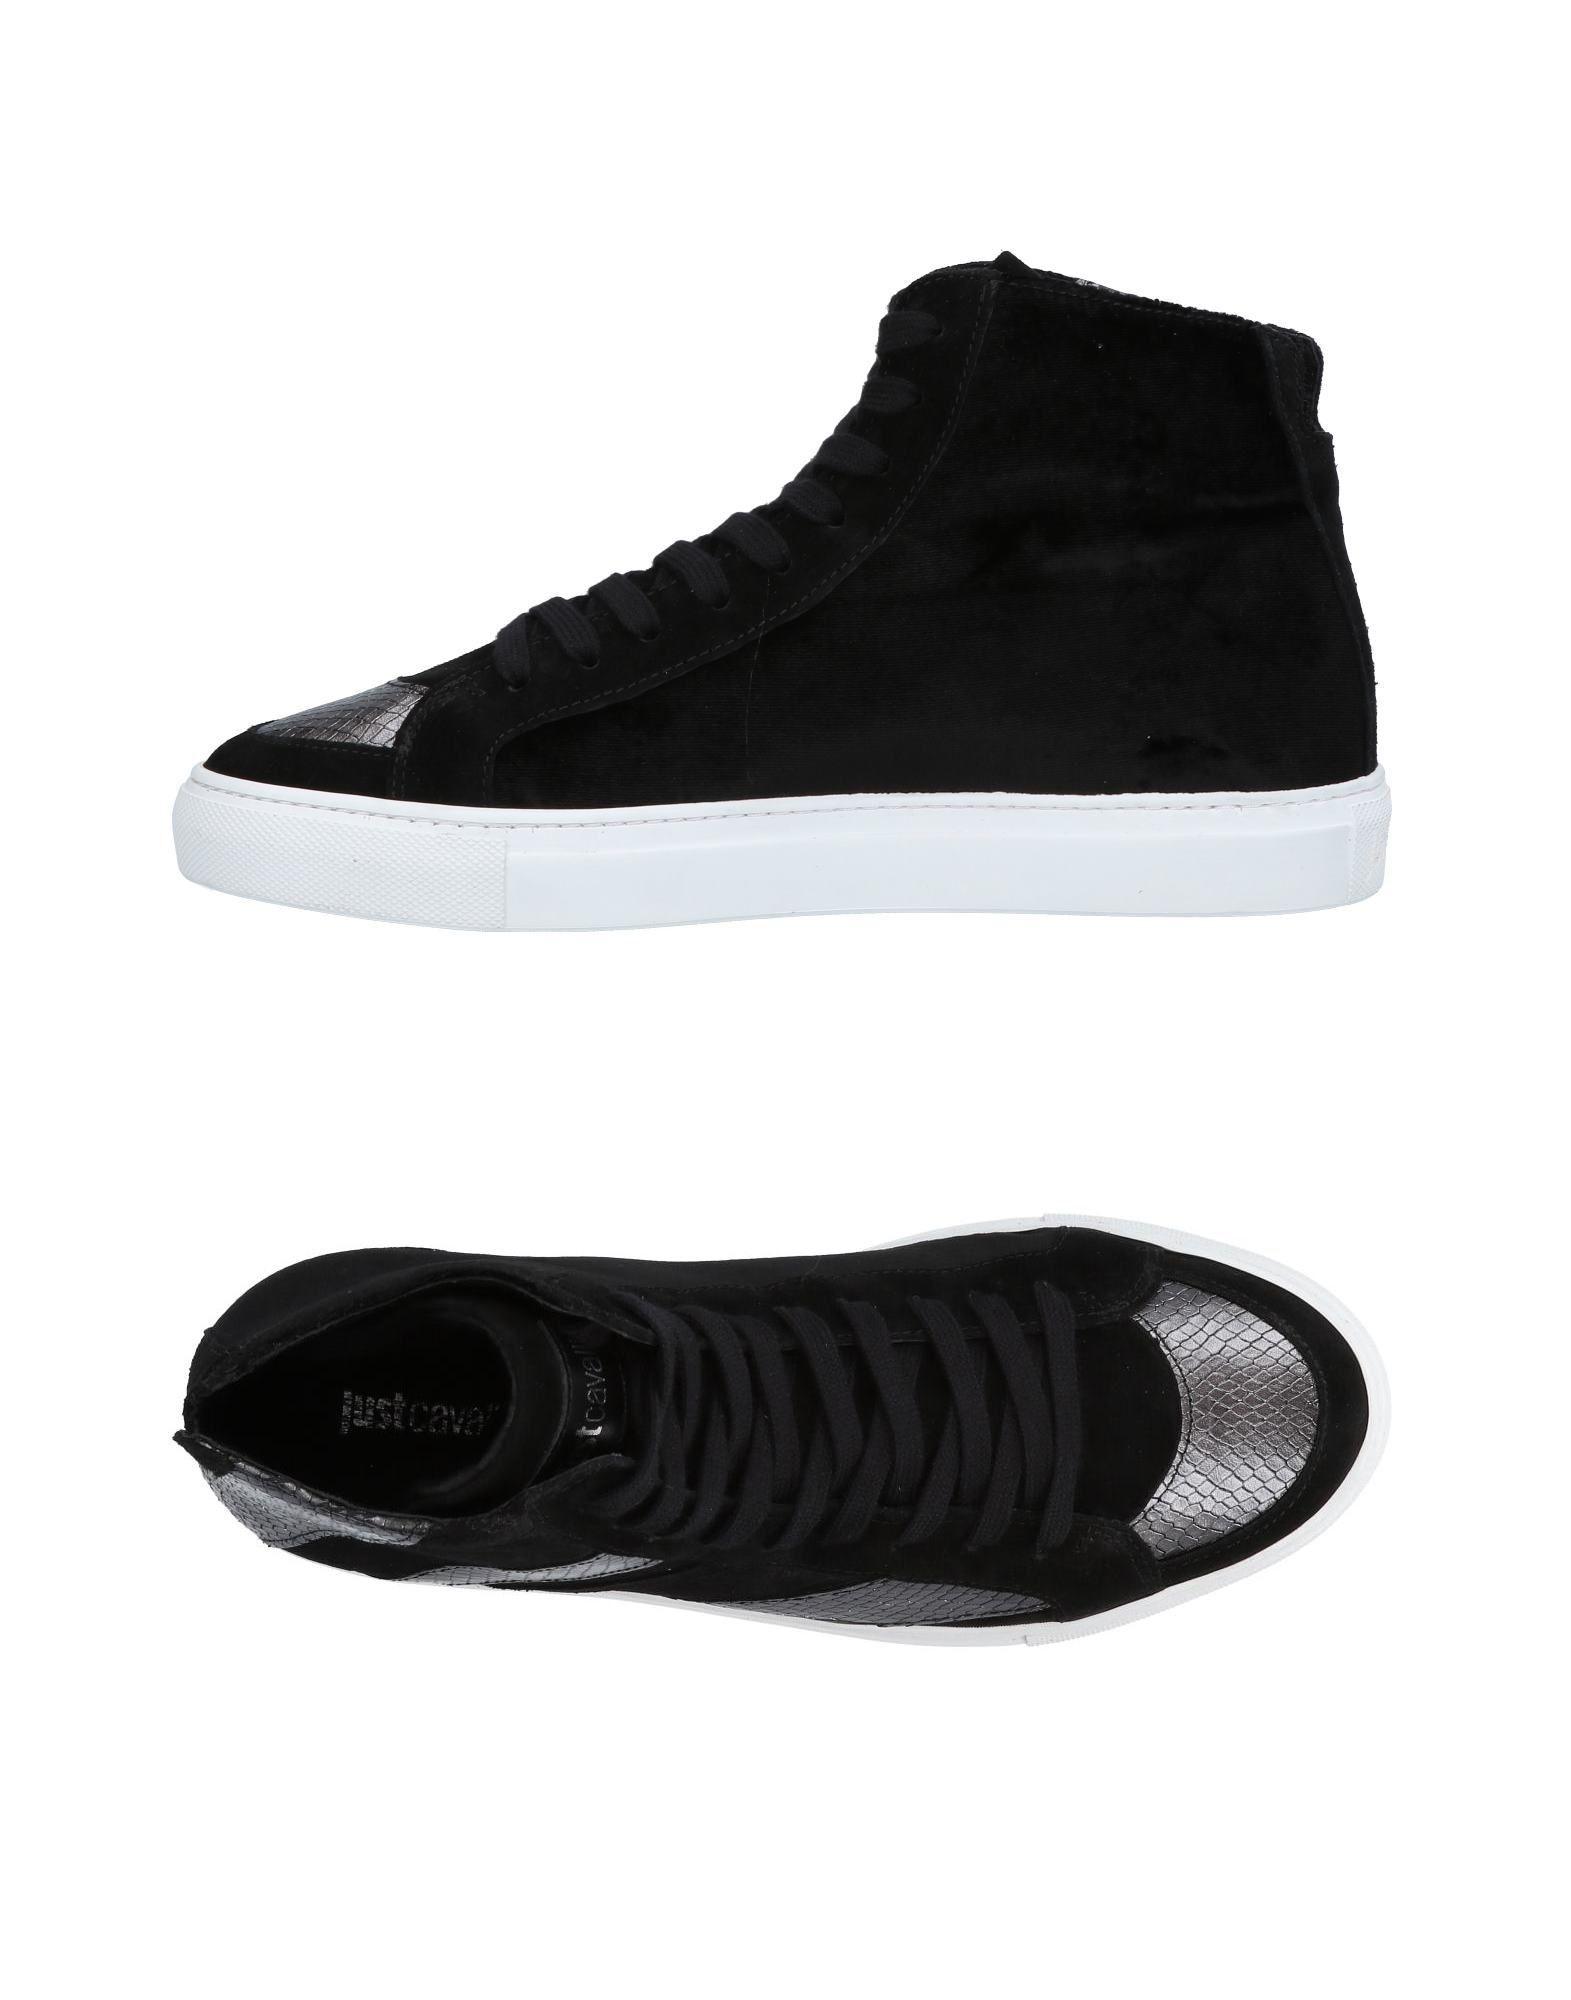 Just Cavalli Sneakers Herren  11469993RJ Gute Qualität beliebte Schuhe